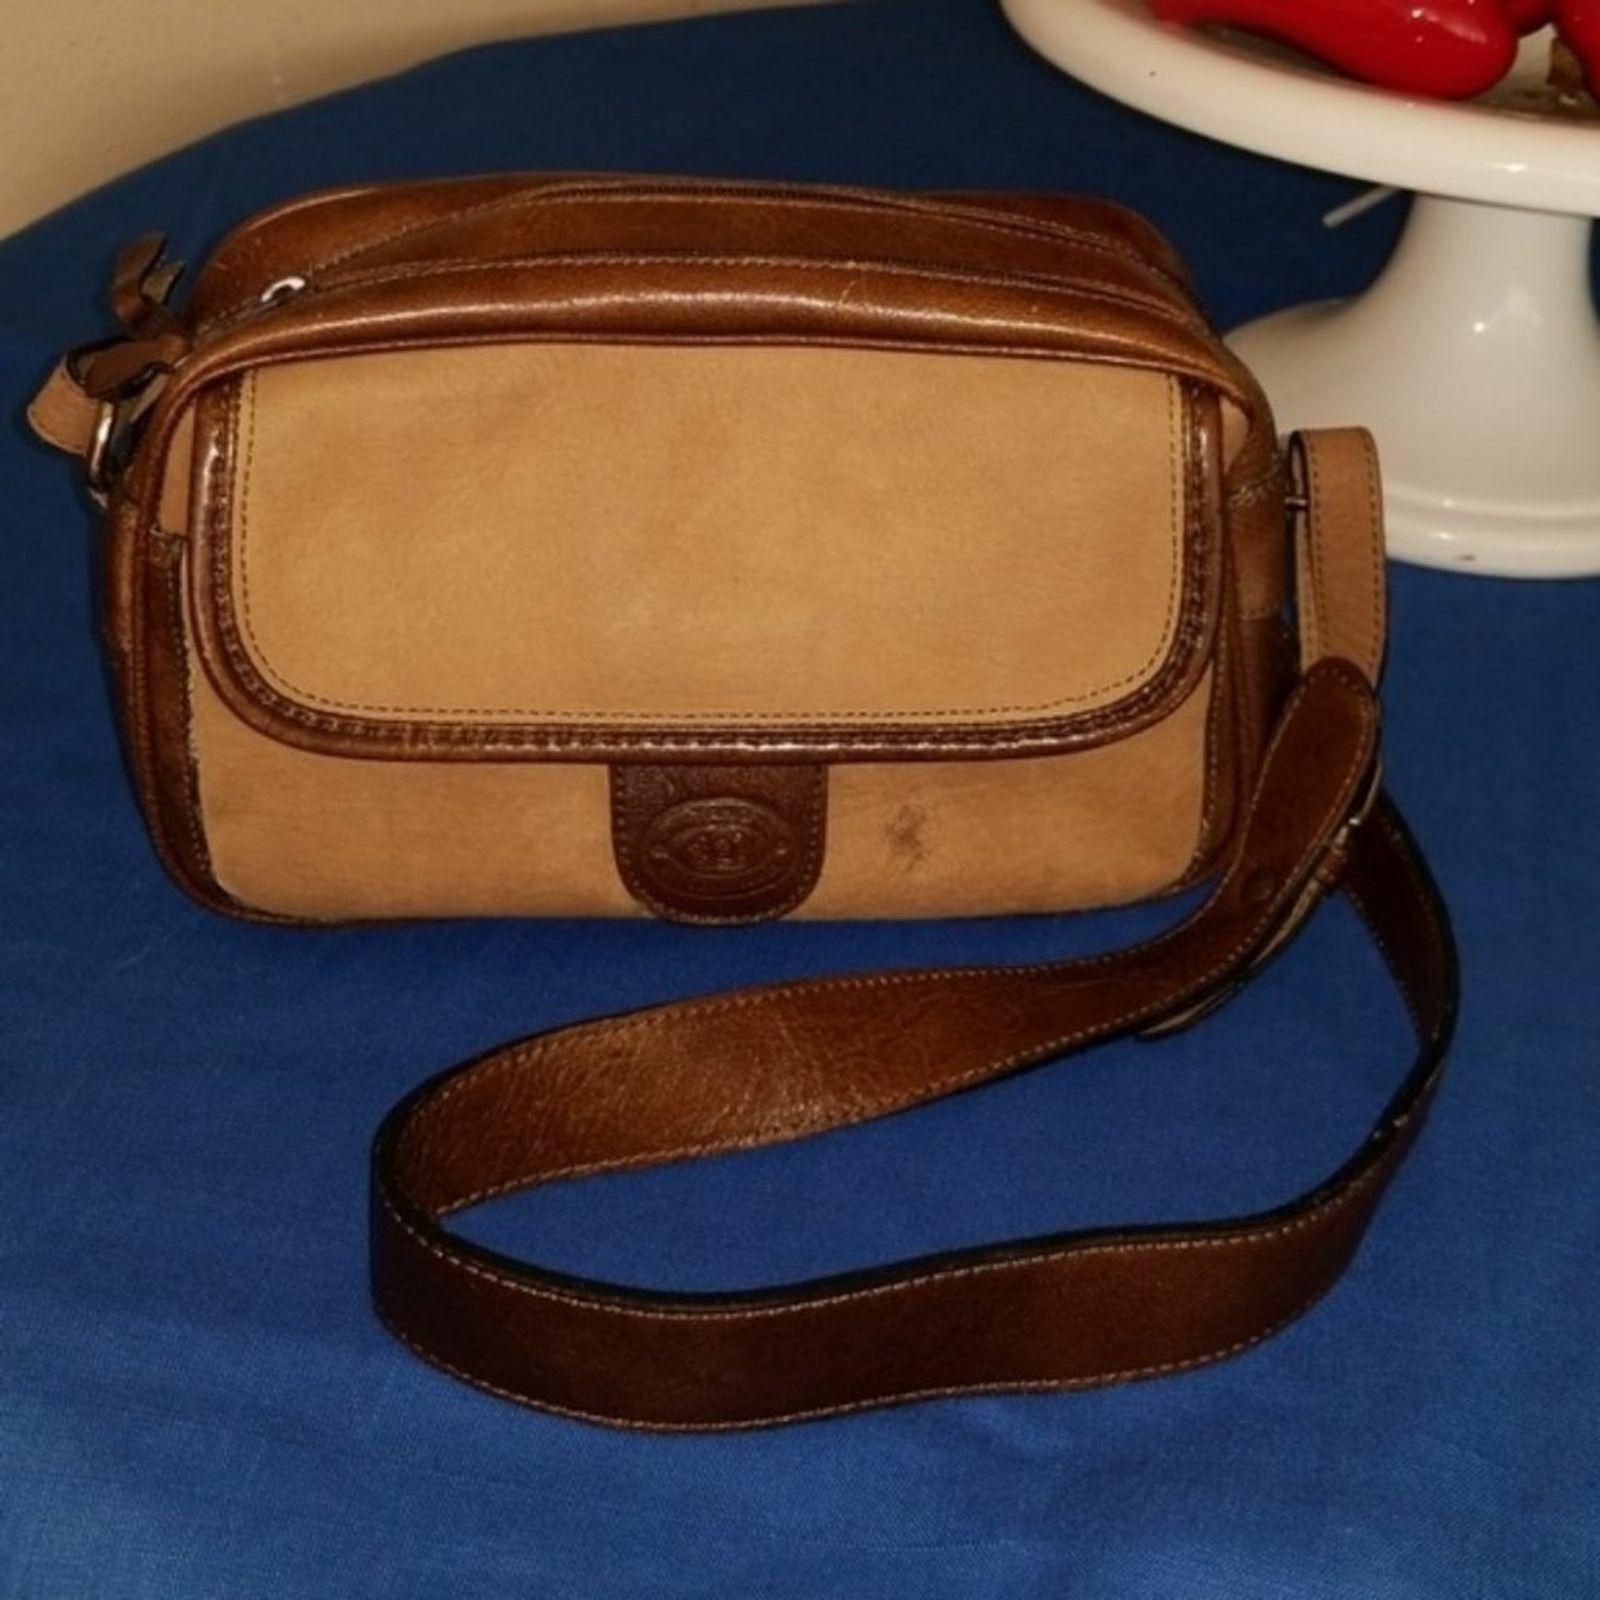 Tano International double zip purse crossbody